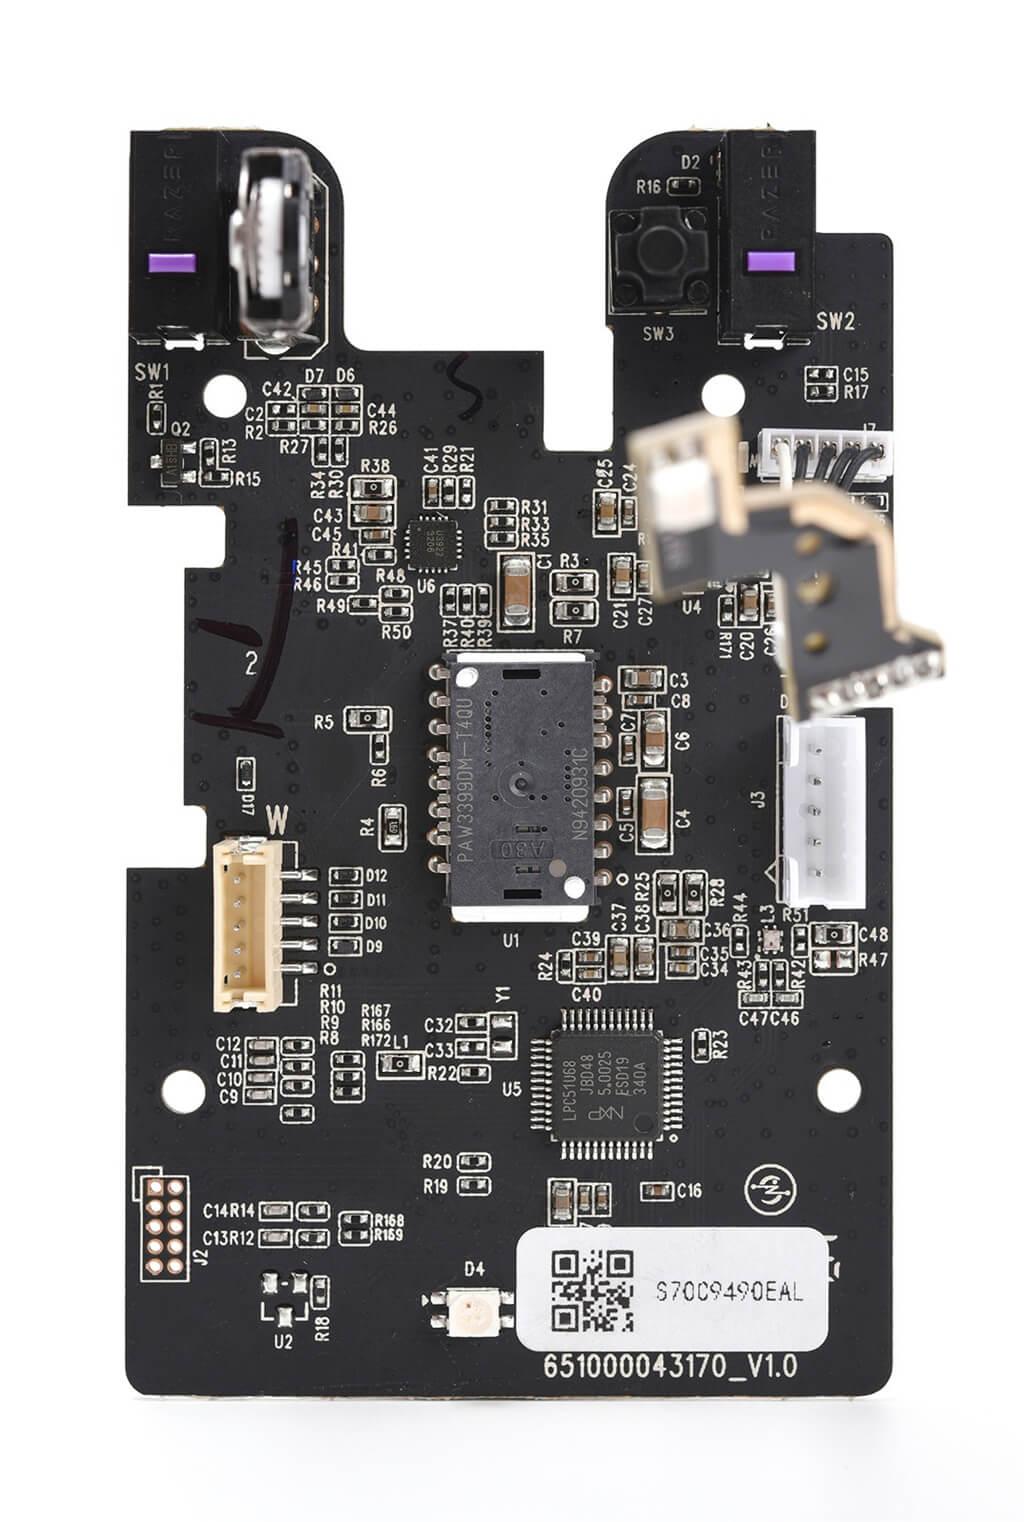 Razer DeathAdder V2 Microcontroller